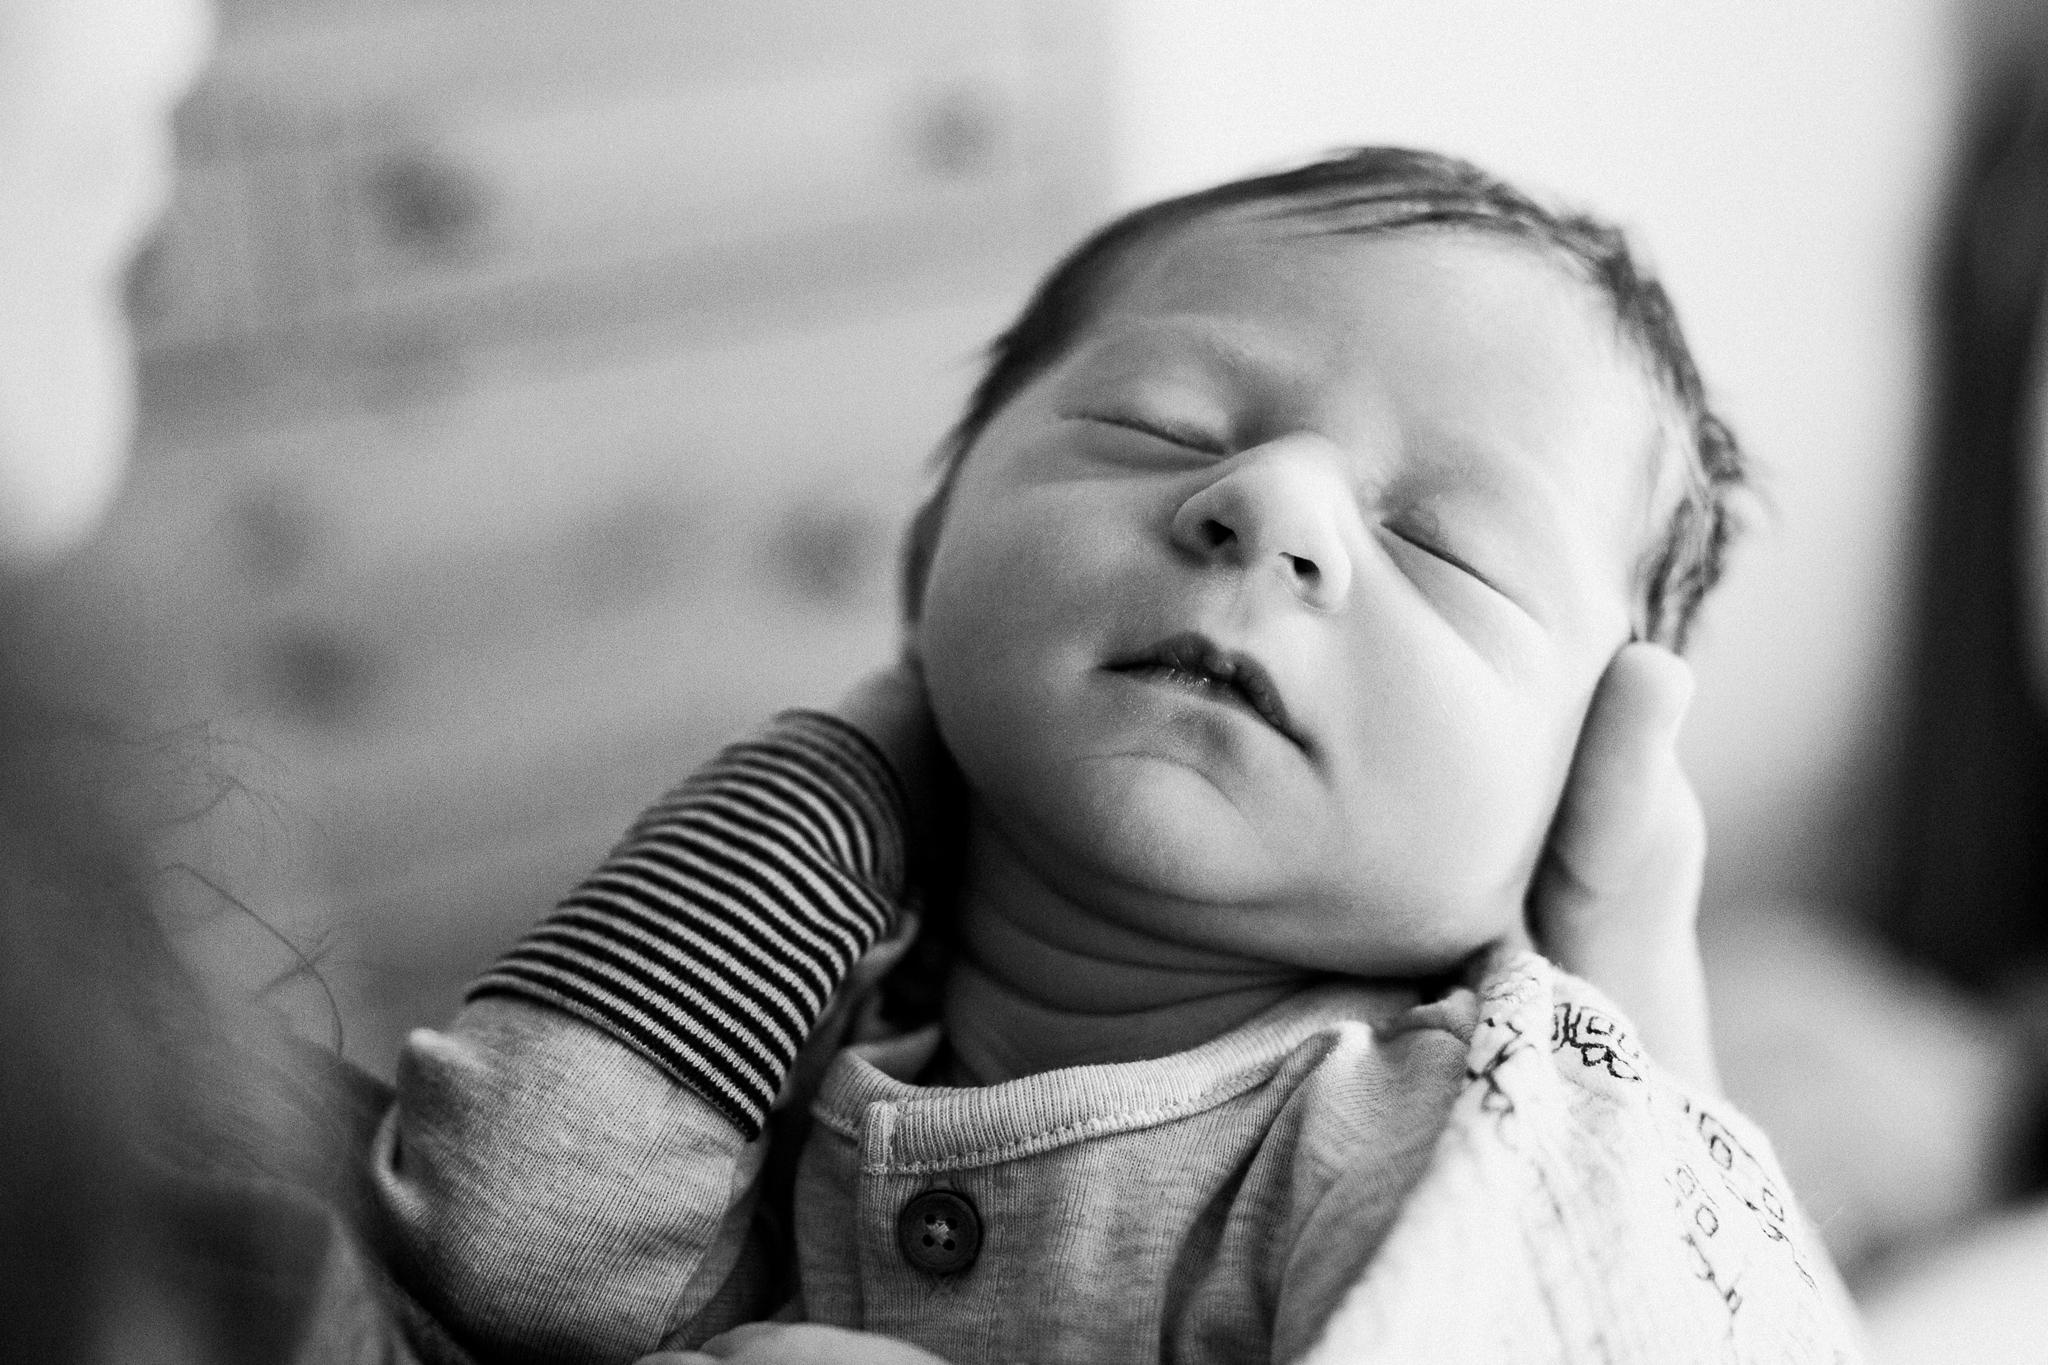 dekalb_il_lifestyle_newborn_photographer_palos_heights_il_0062.jpg